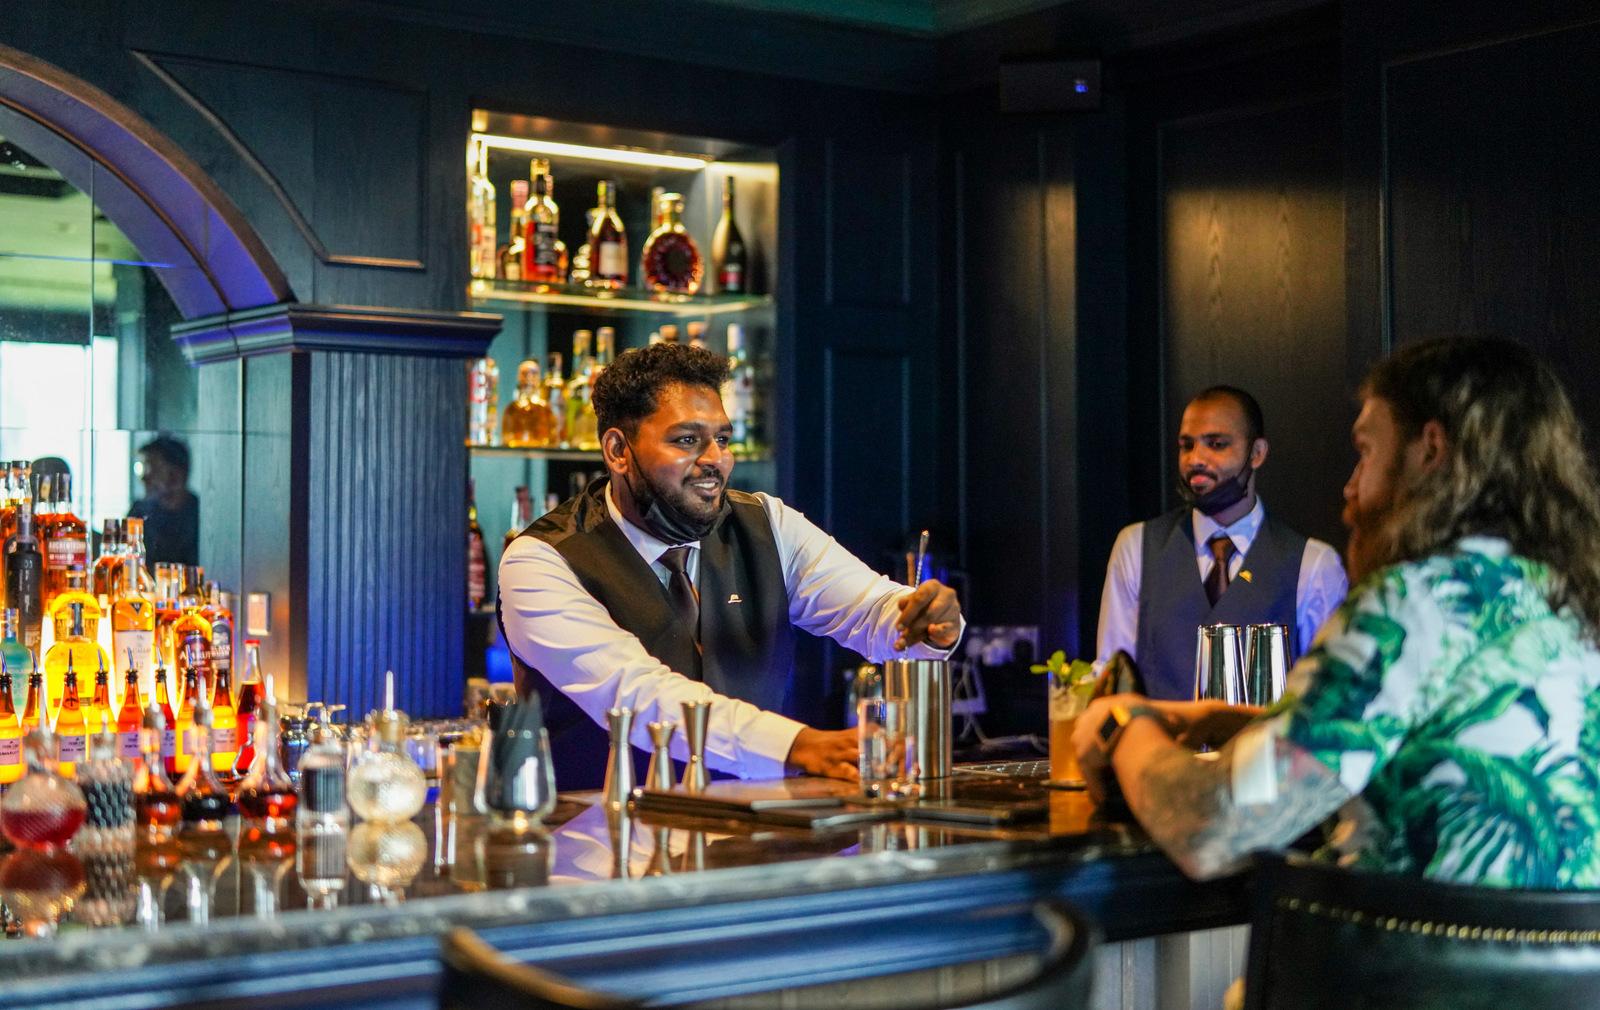 frank's bar, avenue k